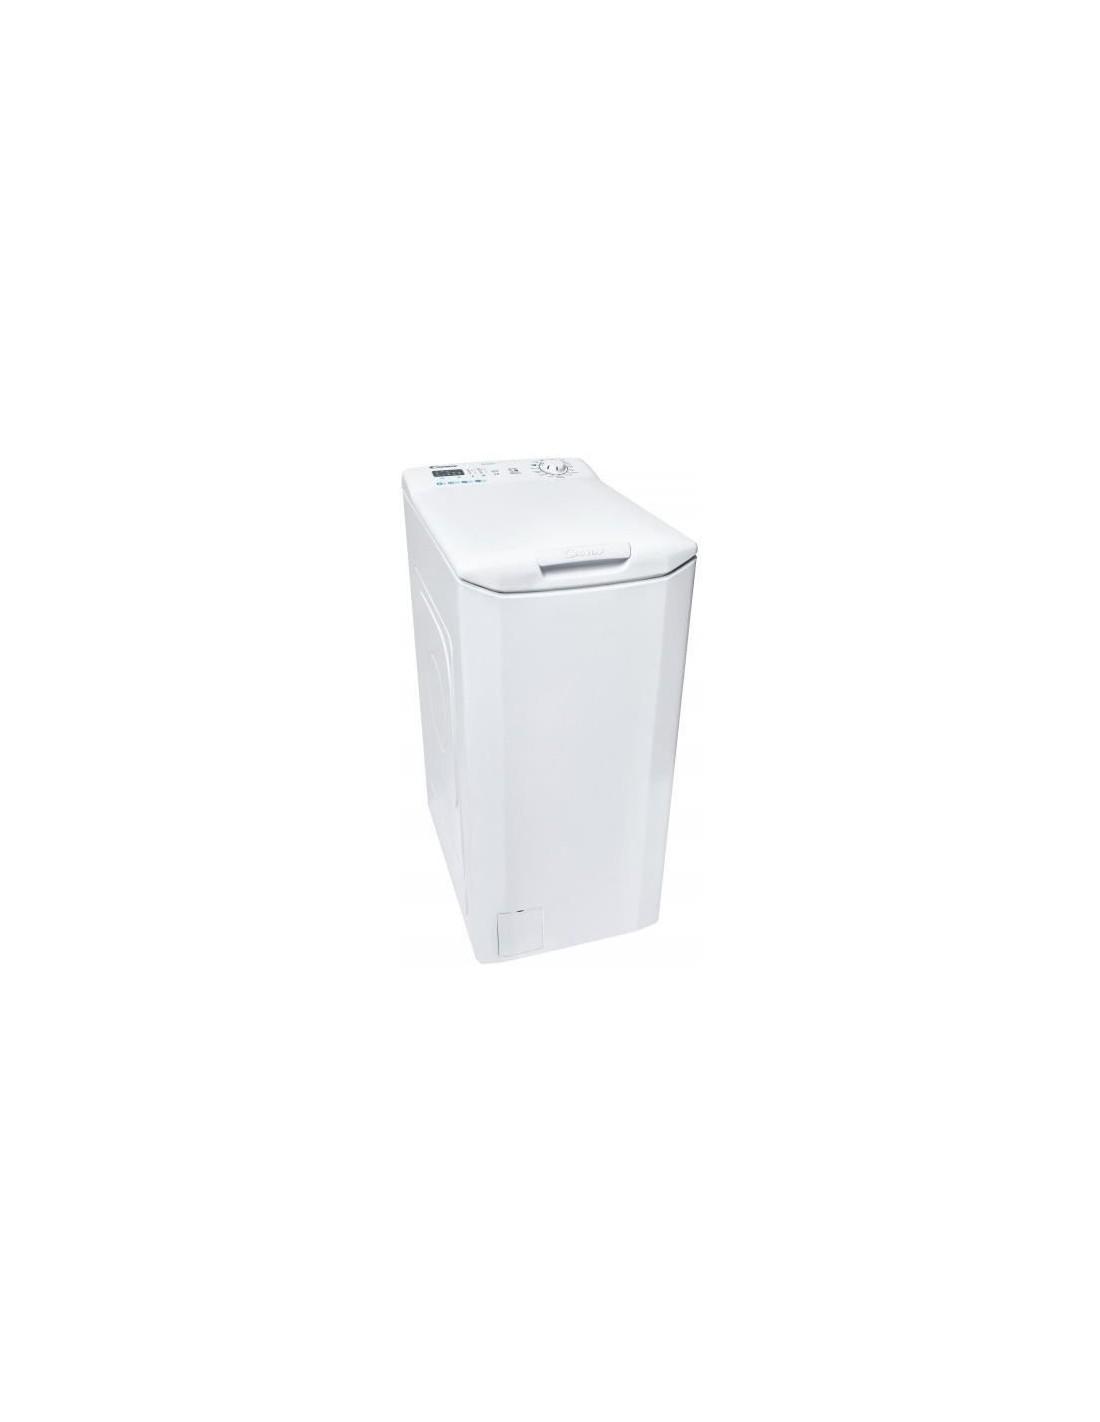 lave linge 7kg 1400 trs min eco bubble blanc samsung wf70f5e5w4w promo electro le sp cialiste. Black Bedroom Furniture Sets. Home Design Ideas